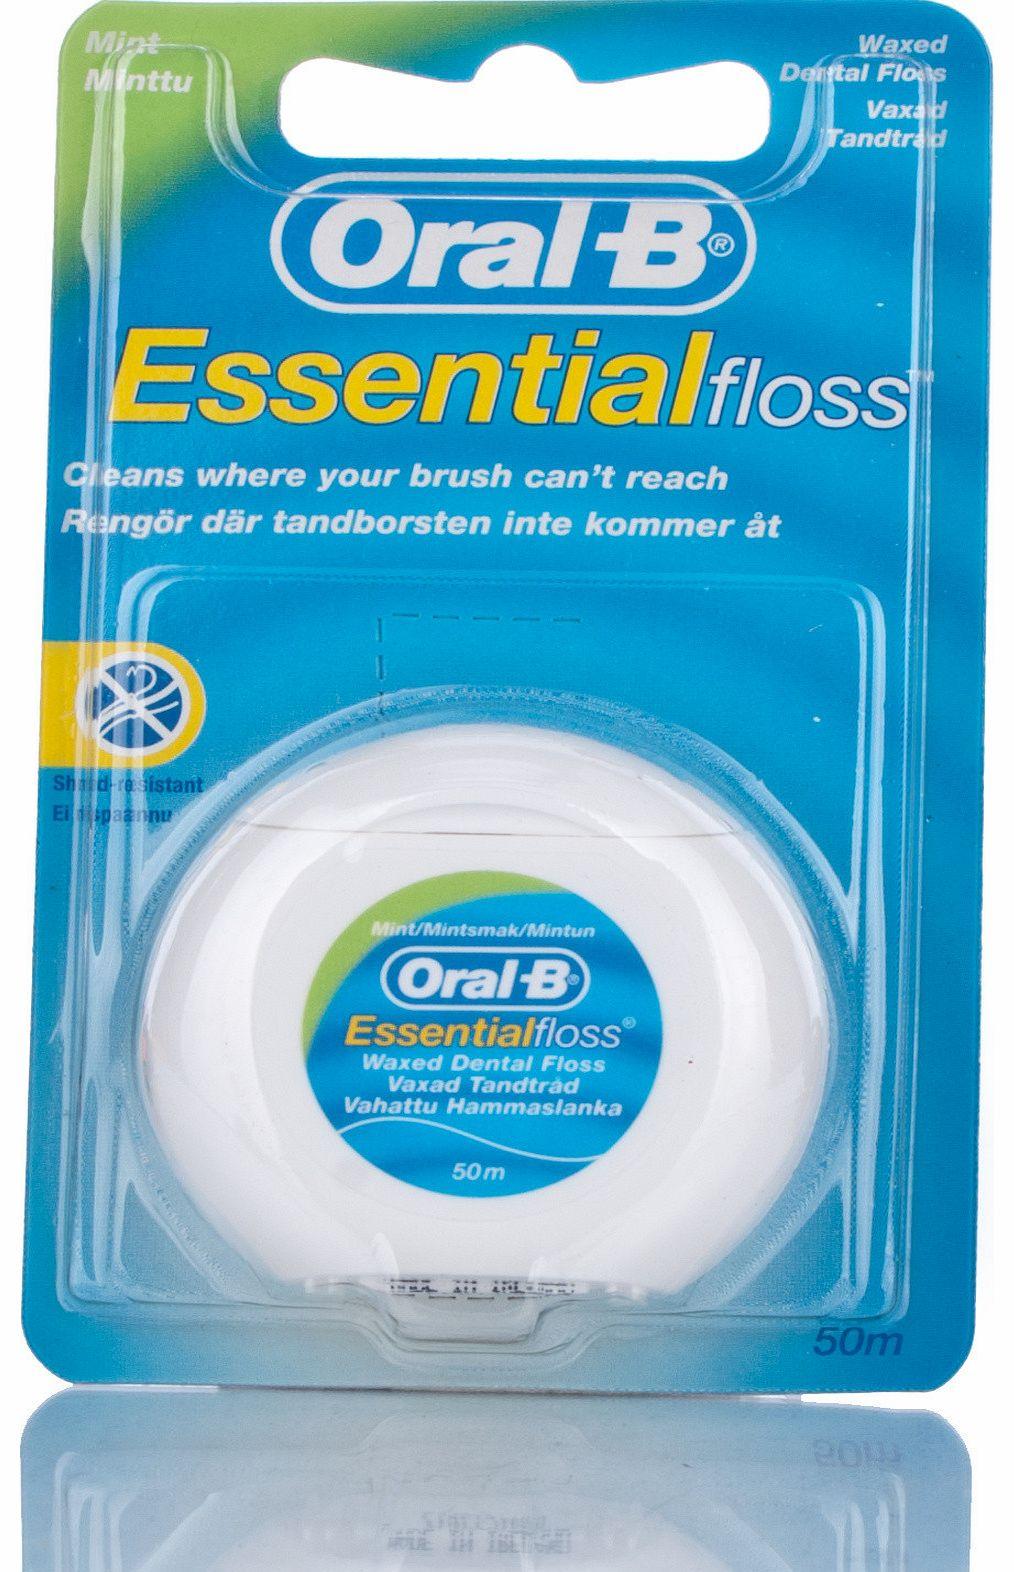 Dental floss reviews